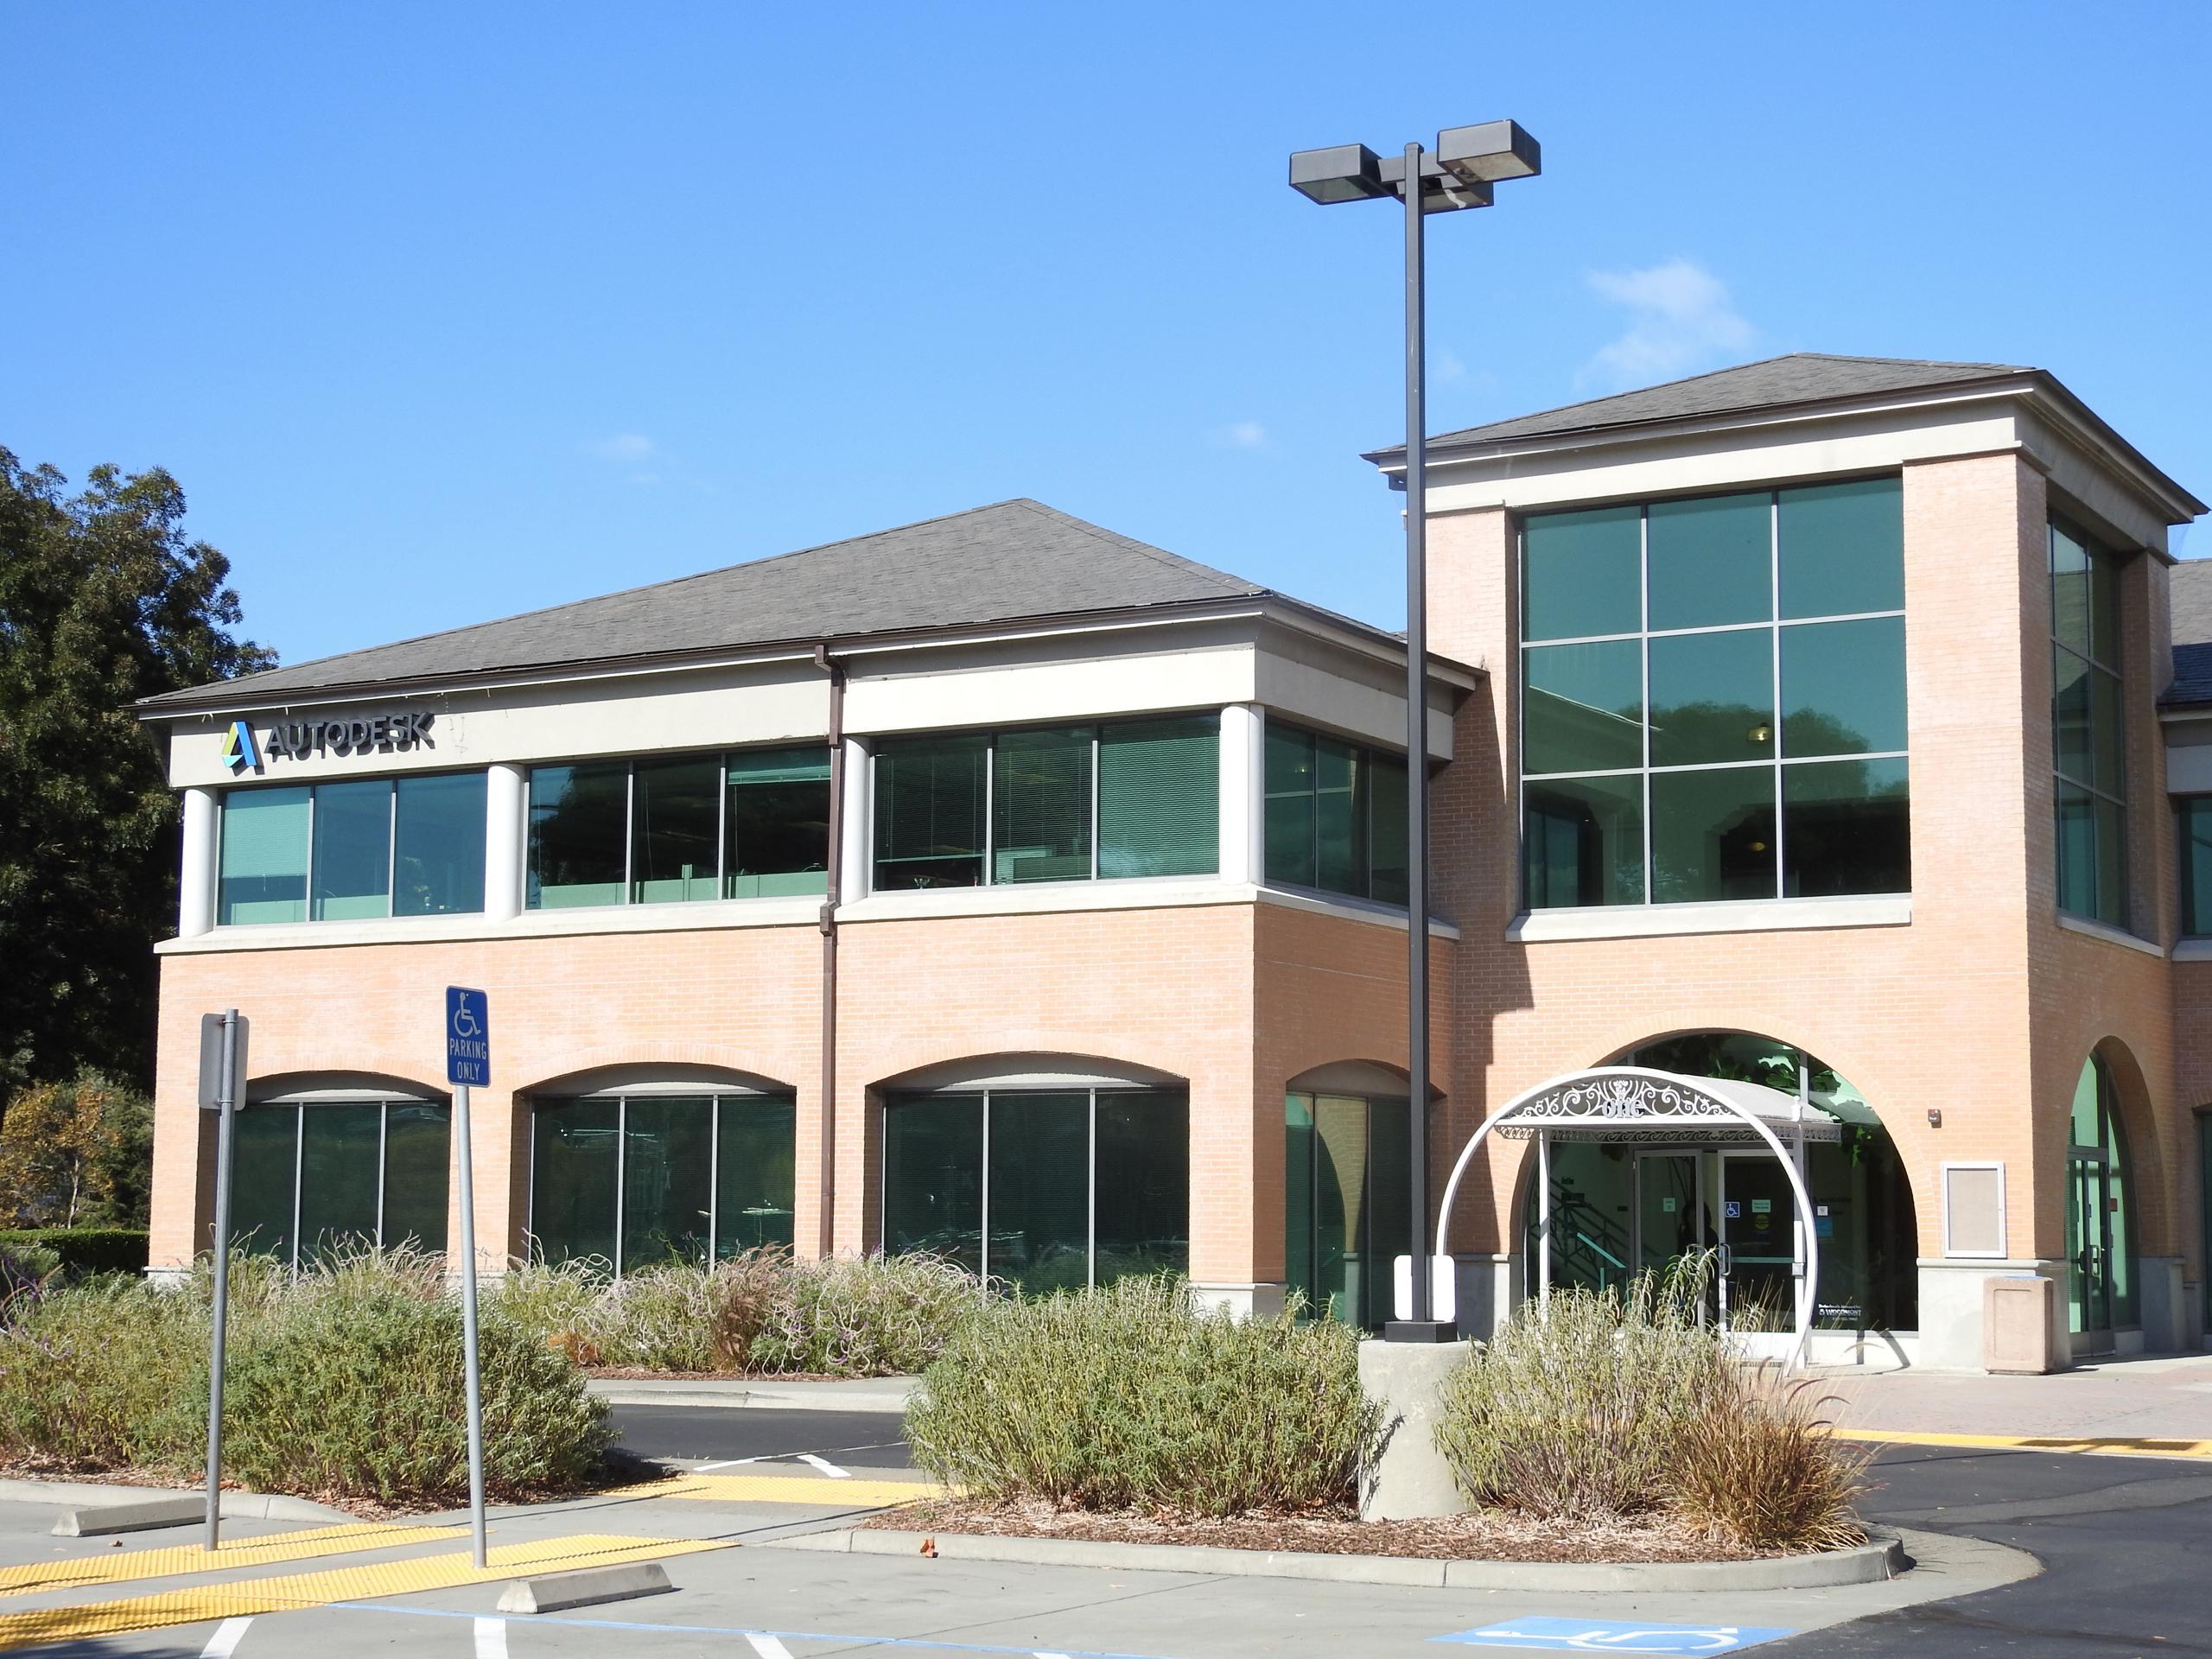 Autodesk's corporate headquarters in Mill Valley, California.